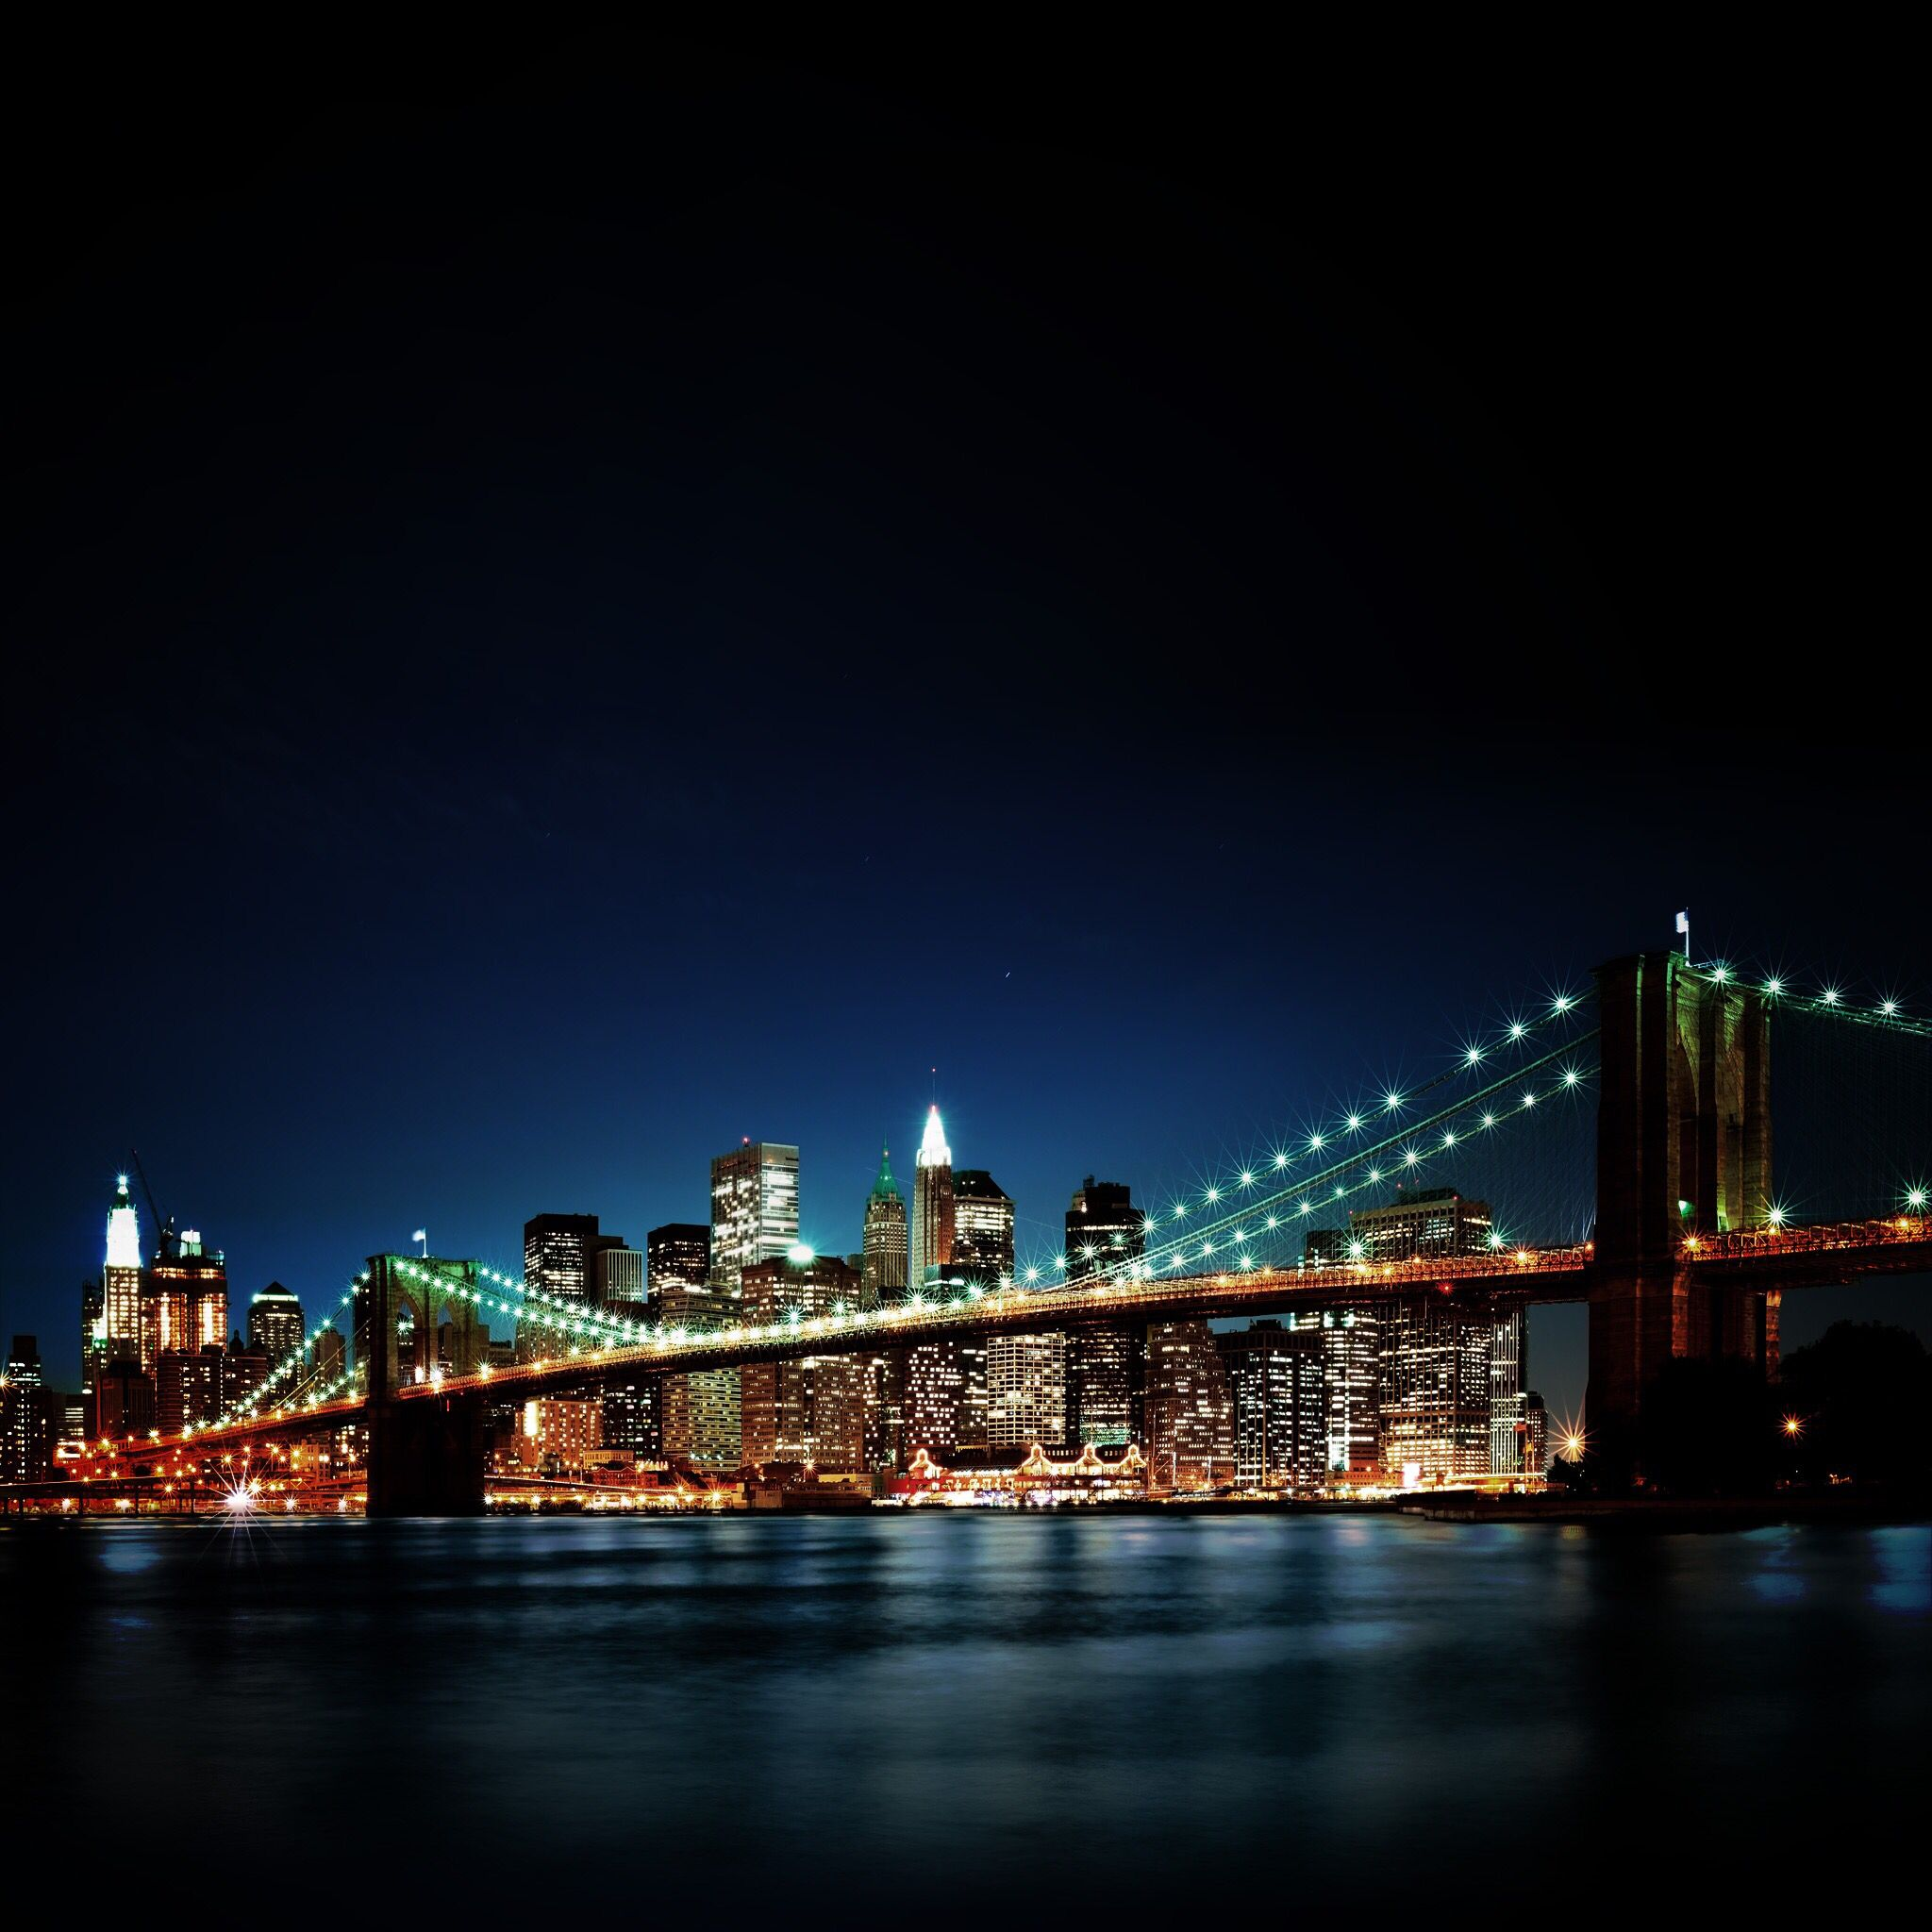 Bridge at night การถ่ายภาพ